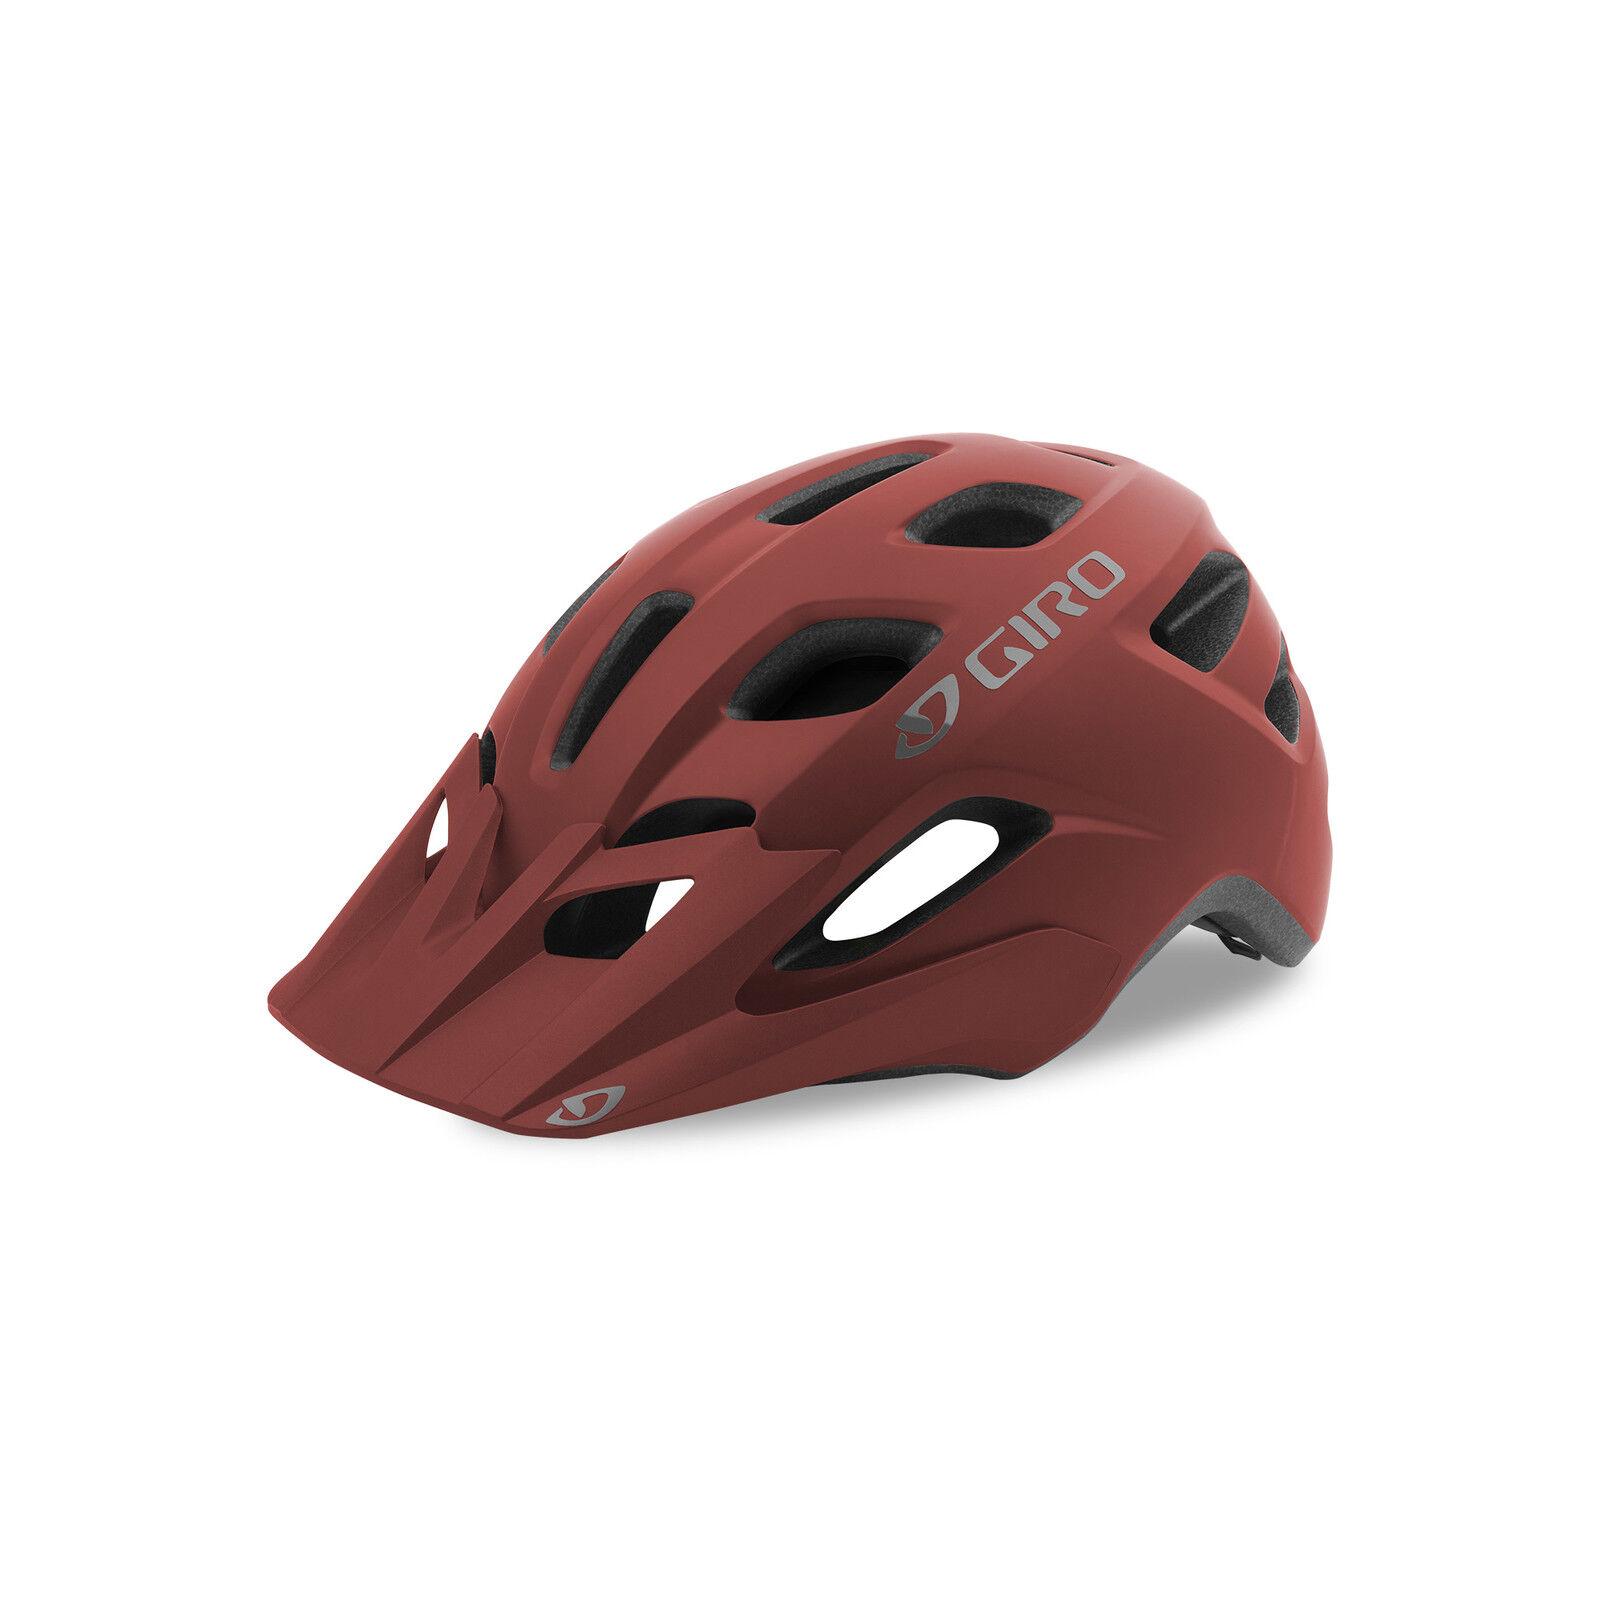 Giro fixture Bicicletta Casco Tg. 5461cm ROSSO 2019